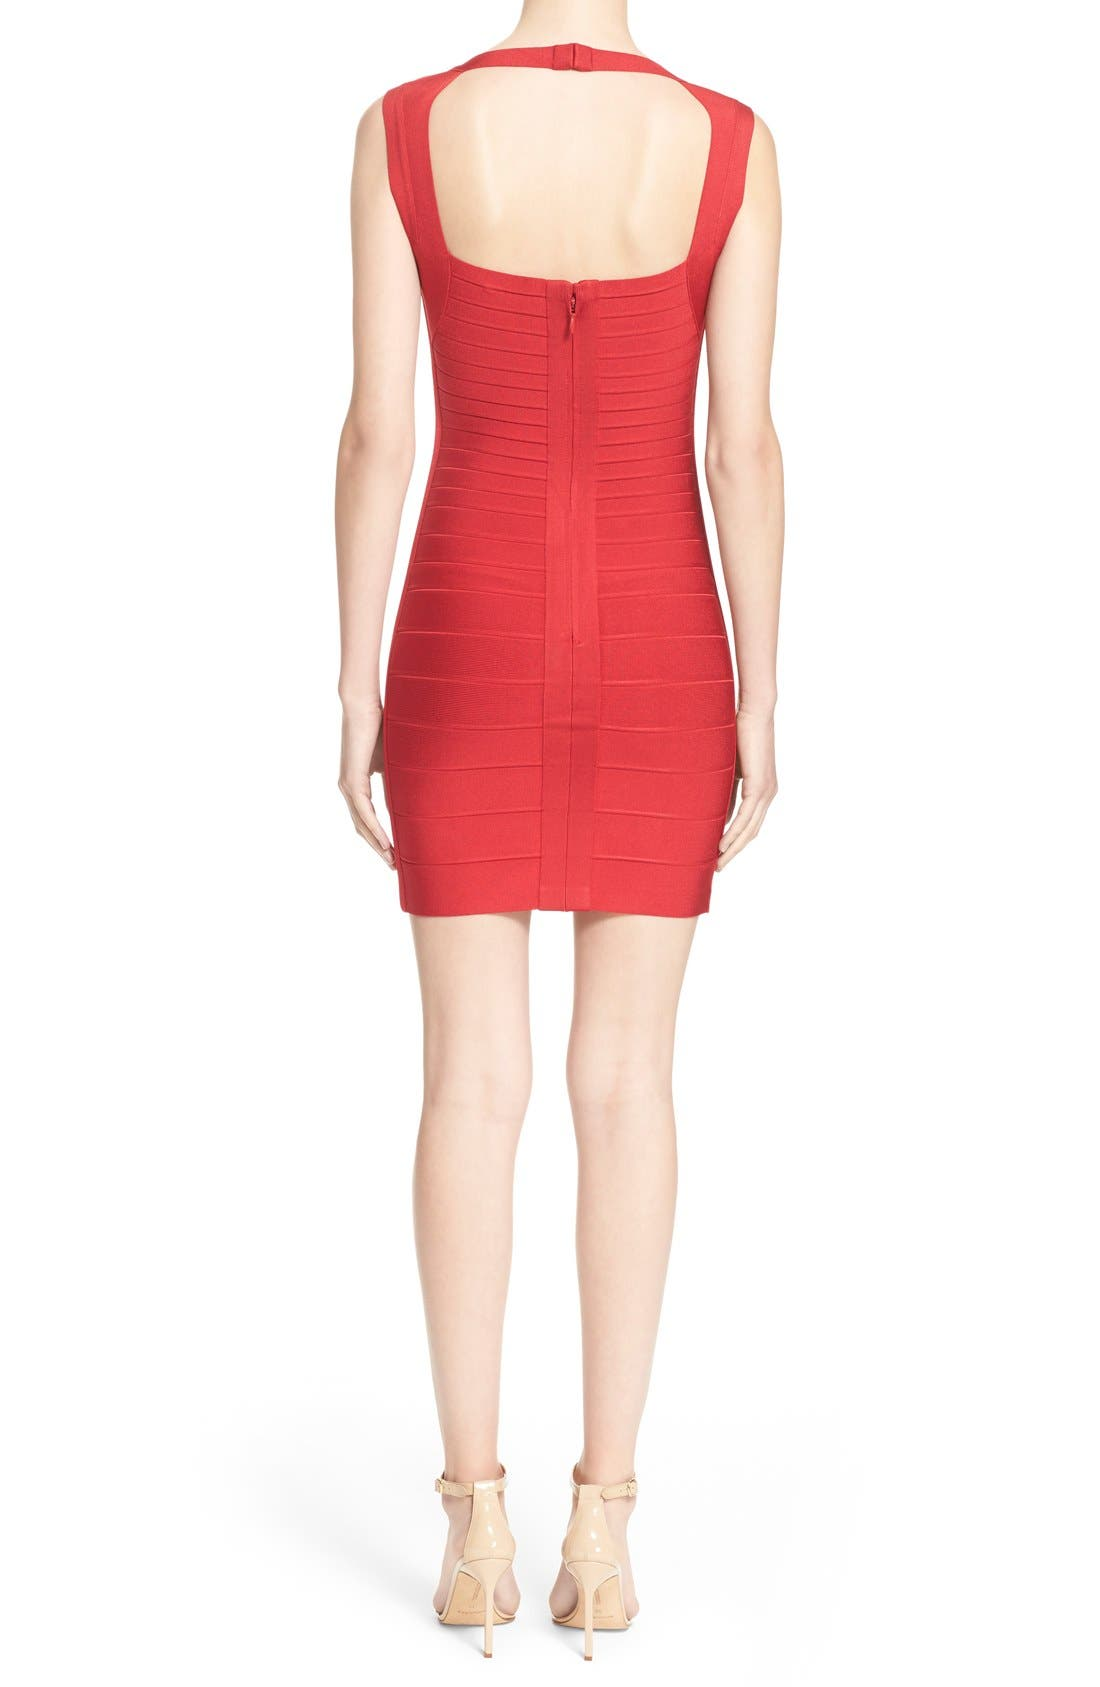 HERVE LEGER,                             Open Back Bandage Dress,                             Alternate thumbnail 2, color,                             616